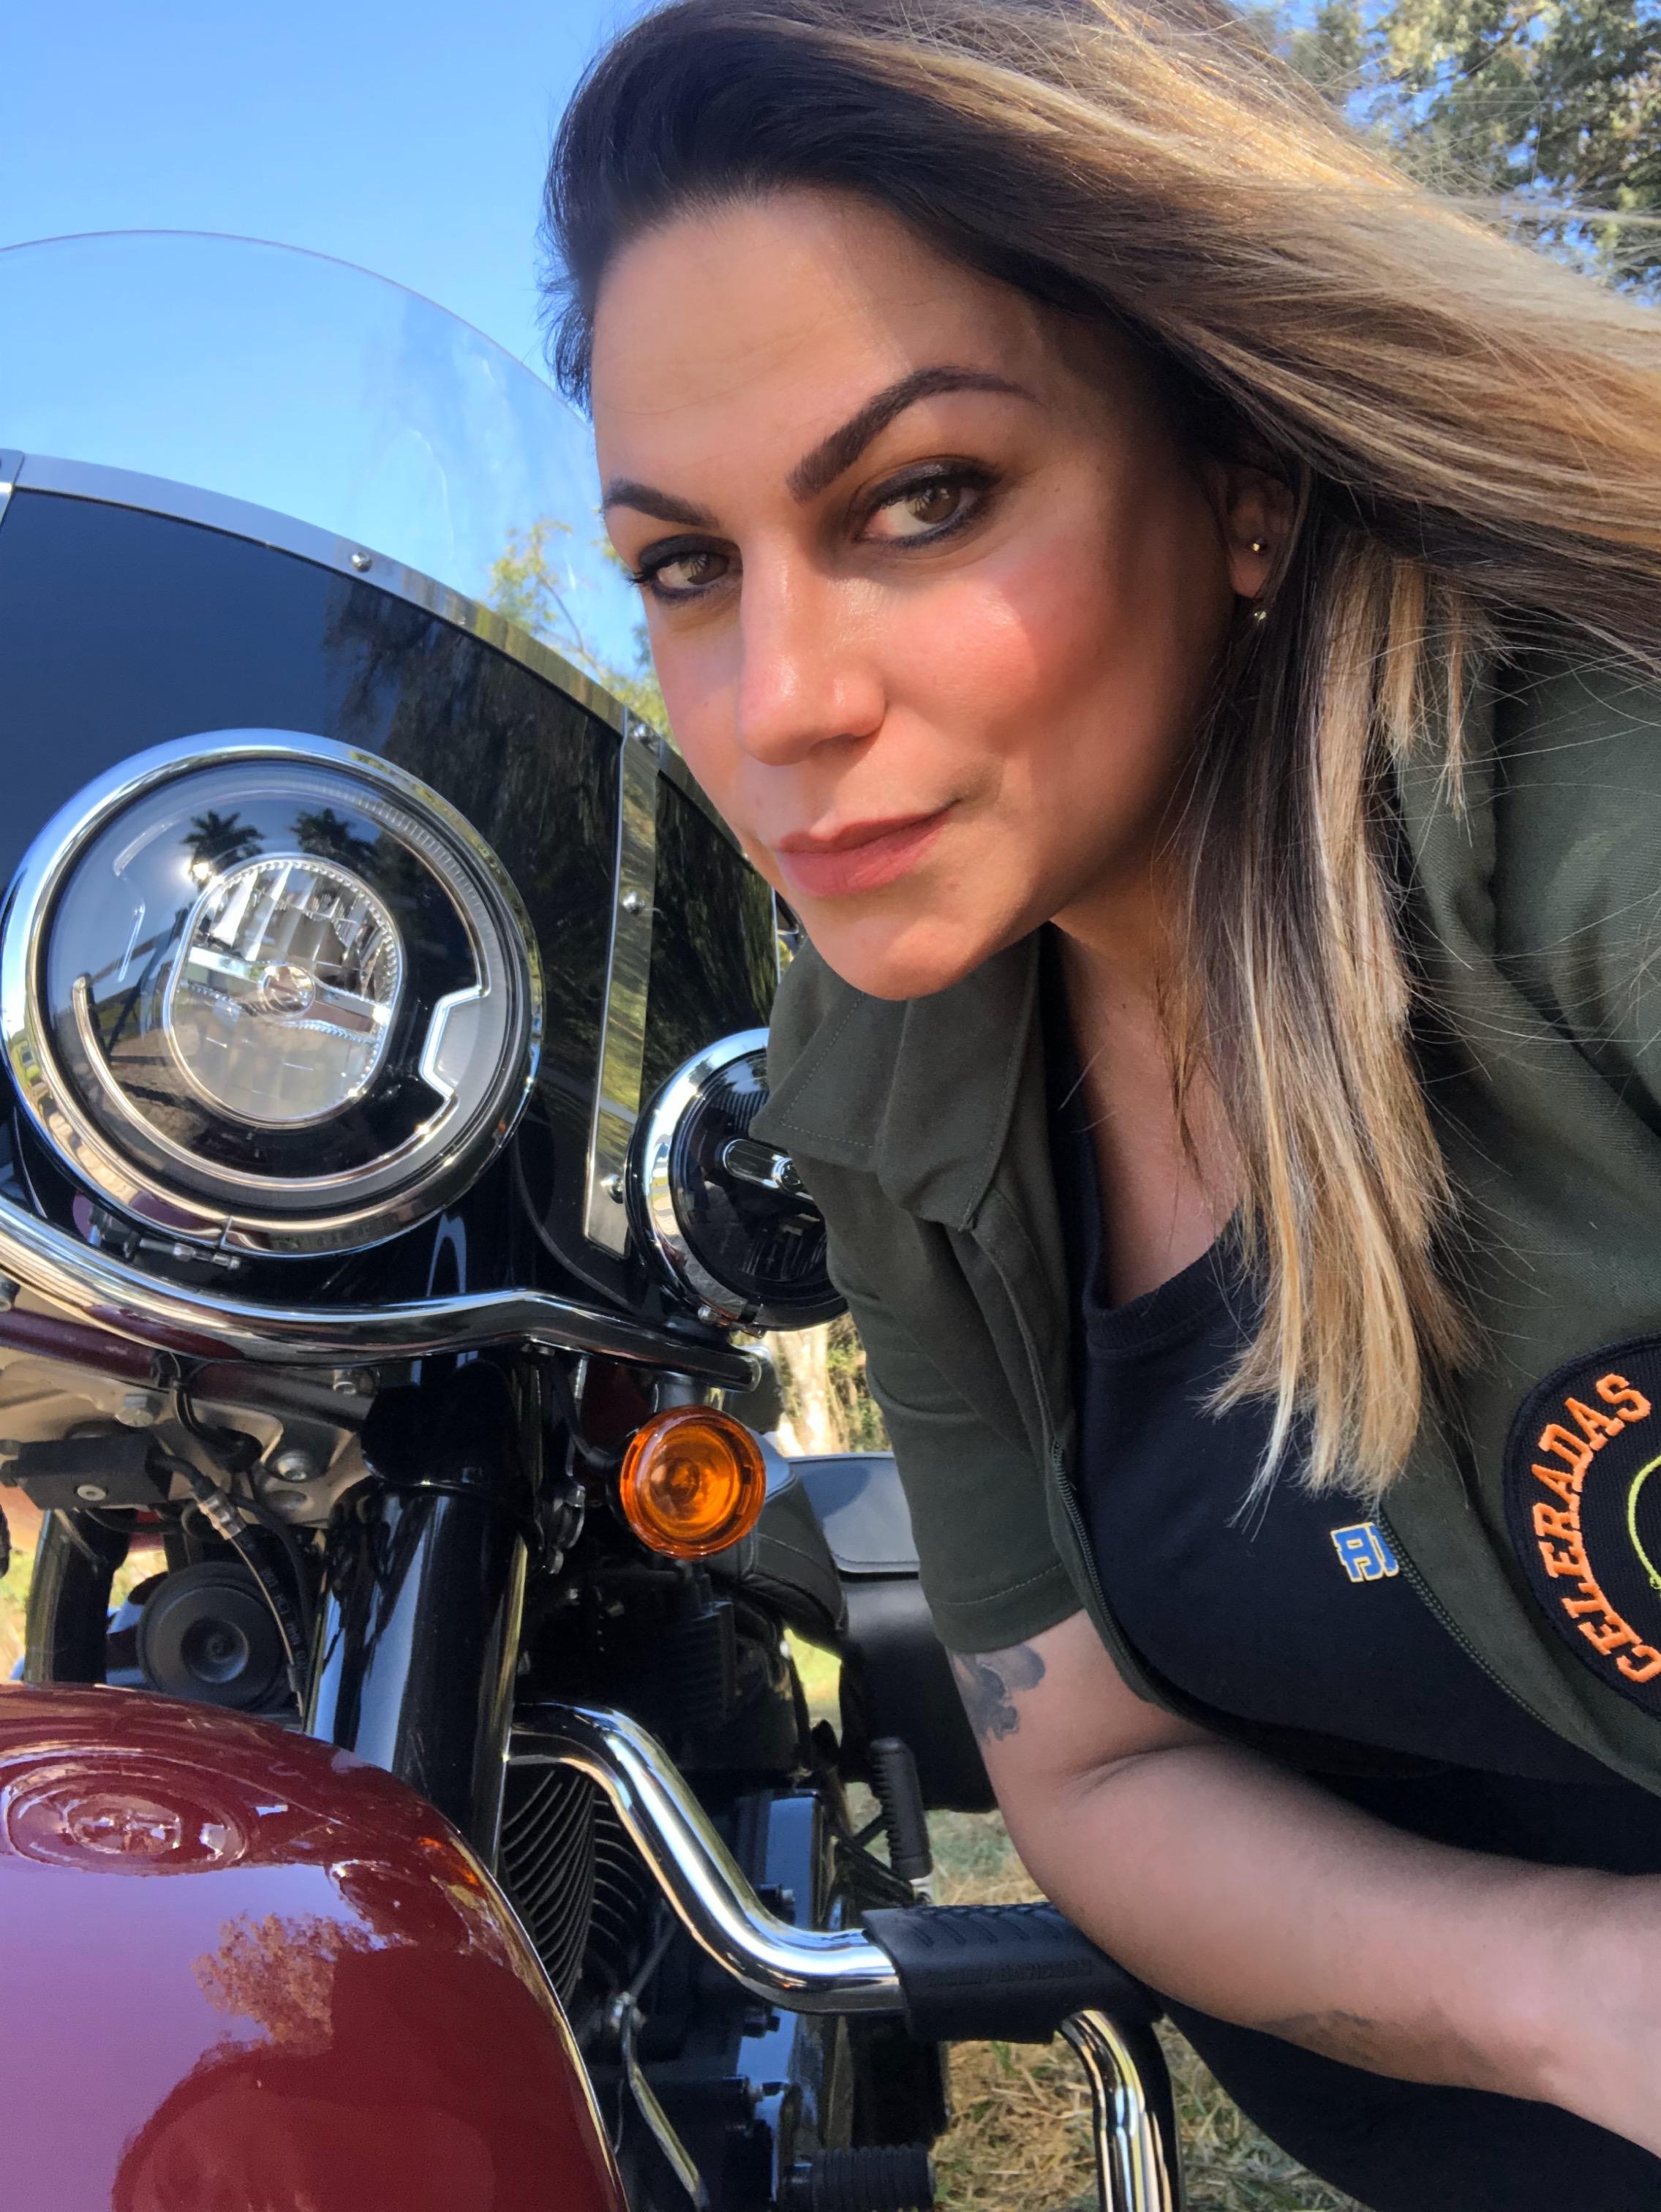 harley davidson heritage – eliana malizia, mulheres de moto, mulher motociclista, test ride, mulher pilota